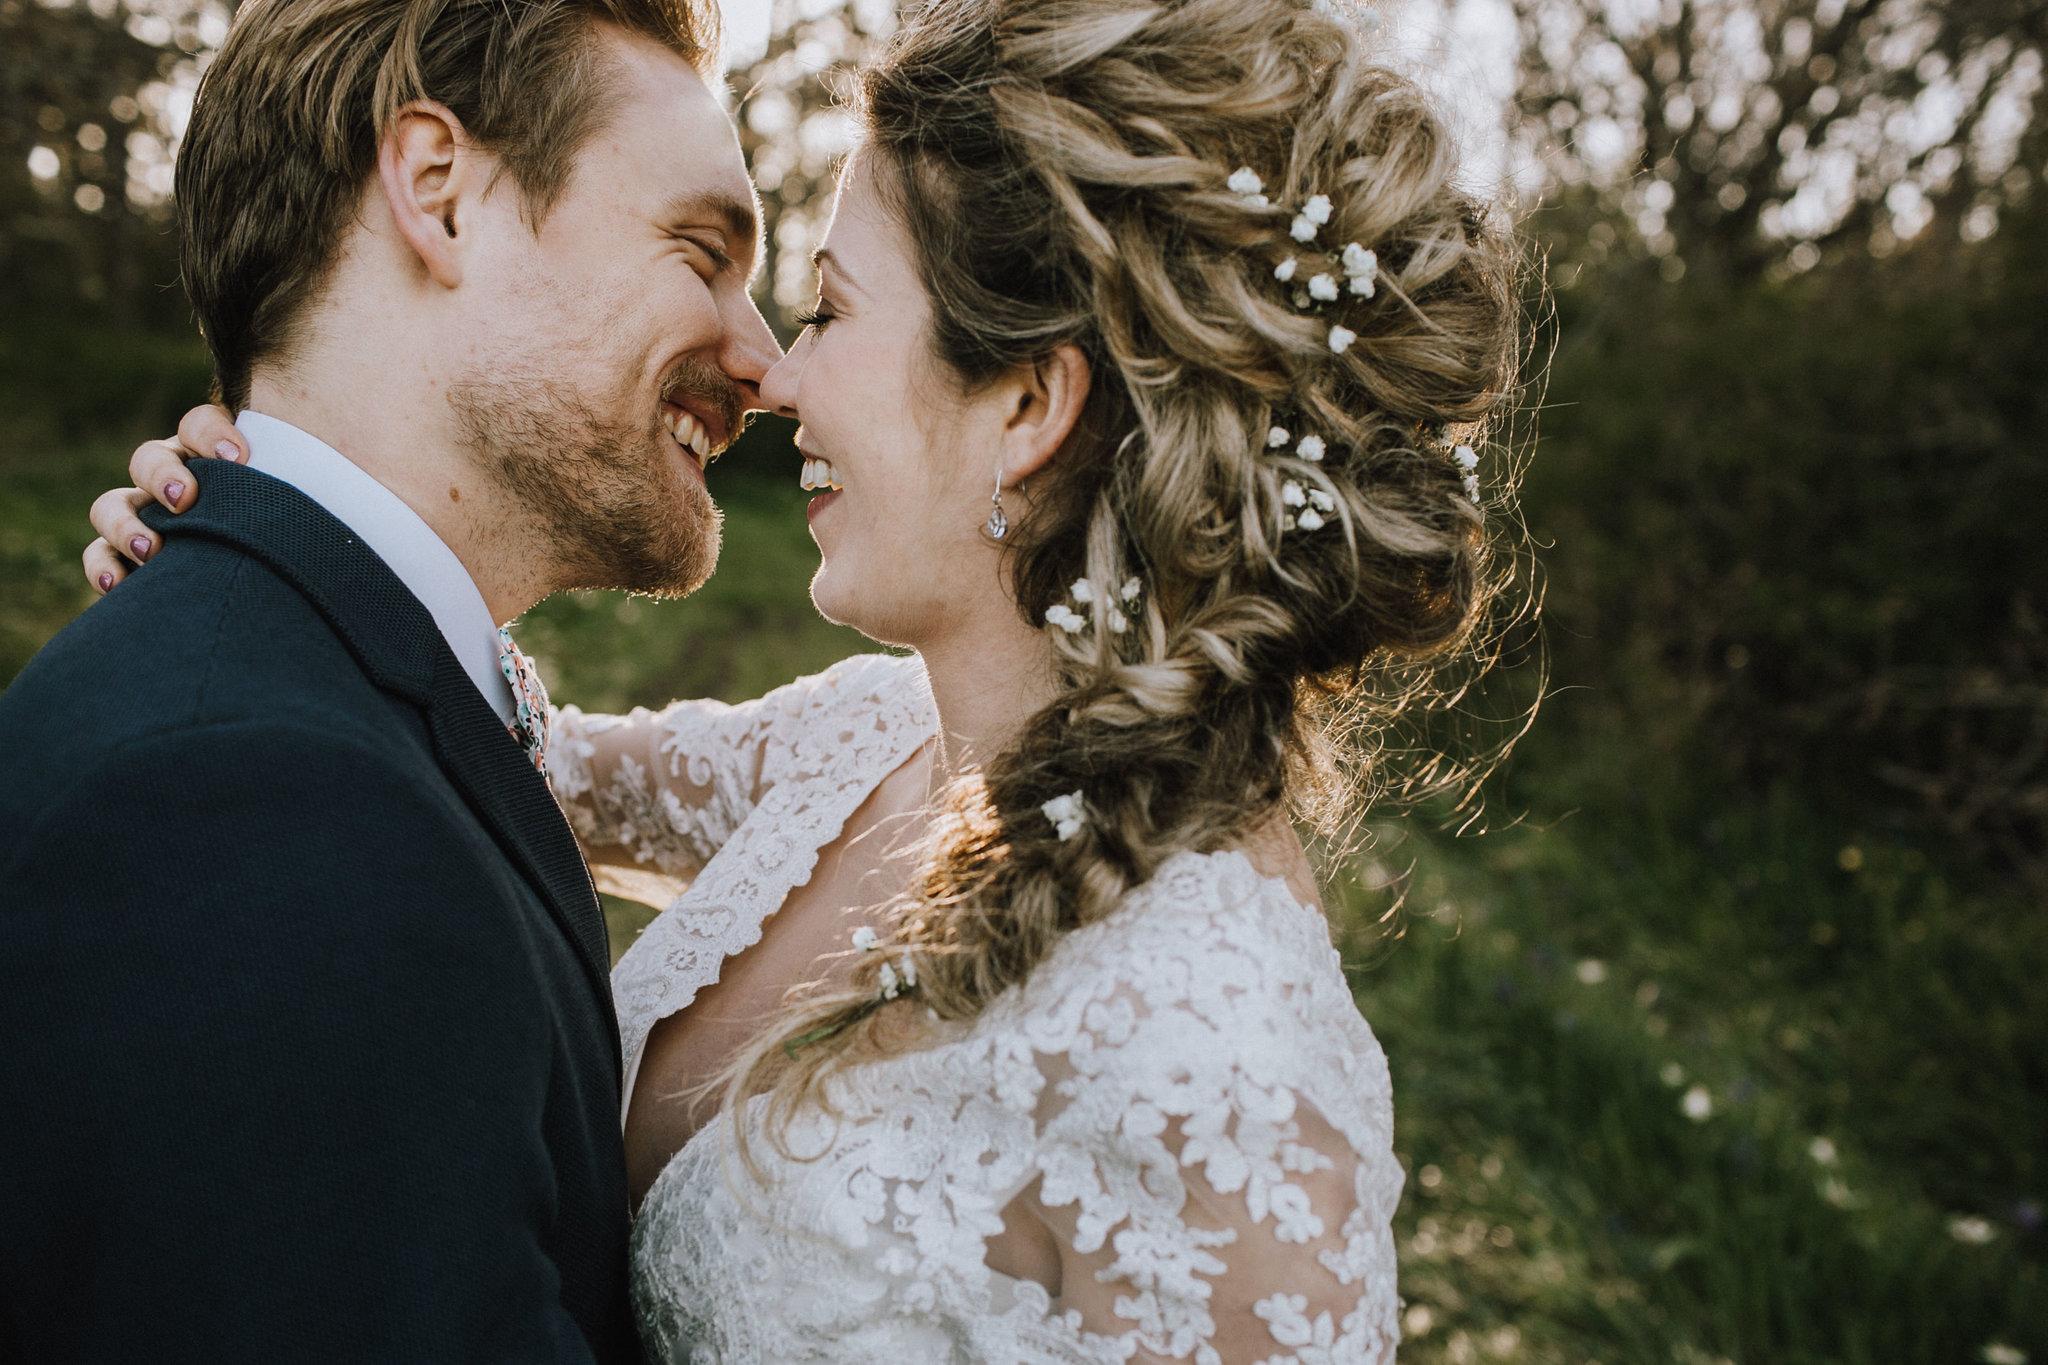 Beach Bridal Session with Couple Kissing Braid in Hair West Coast Weddings Magazine